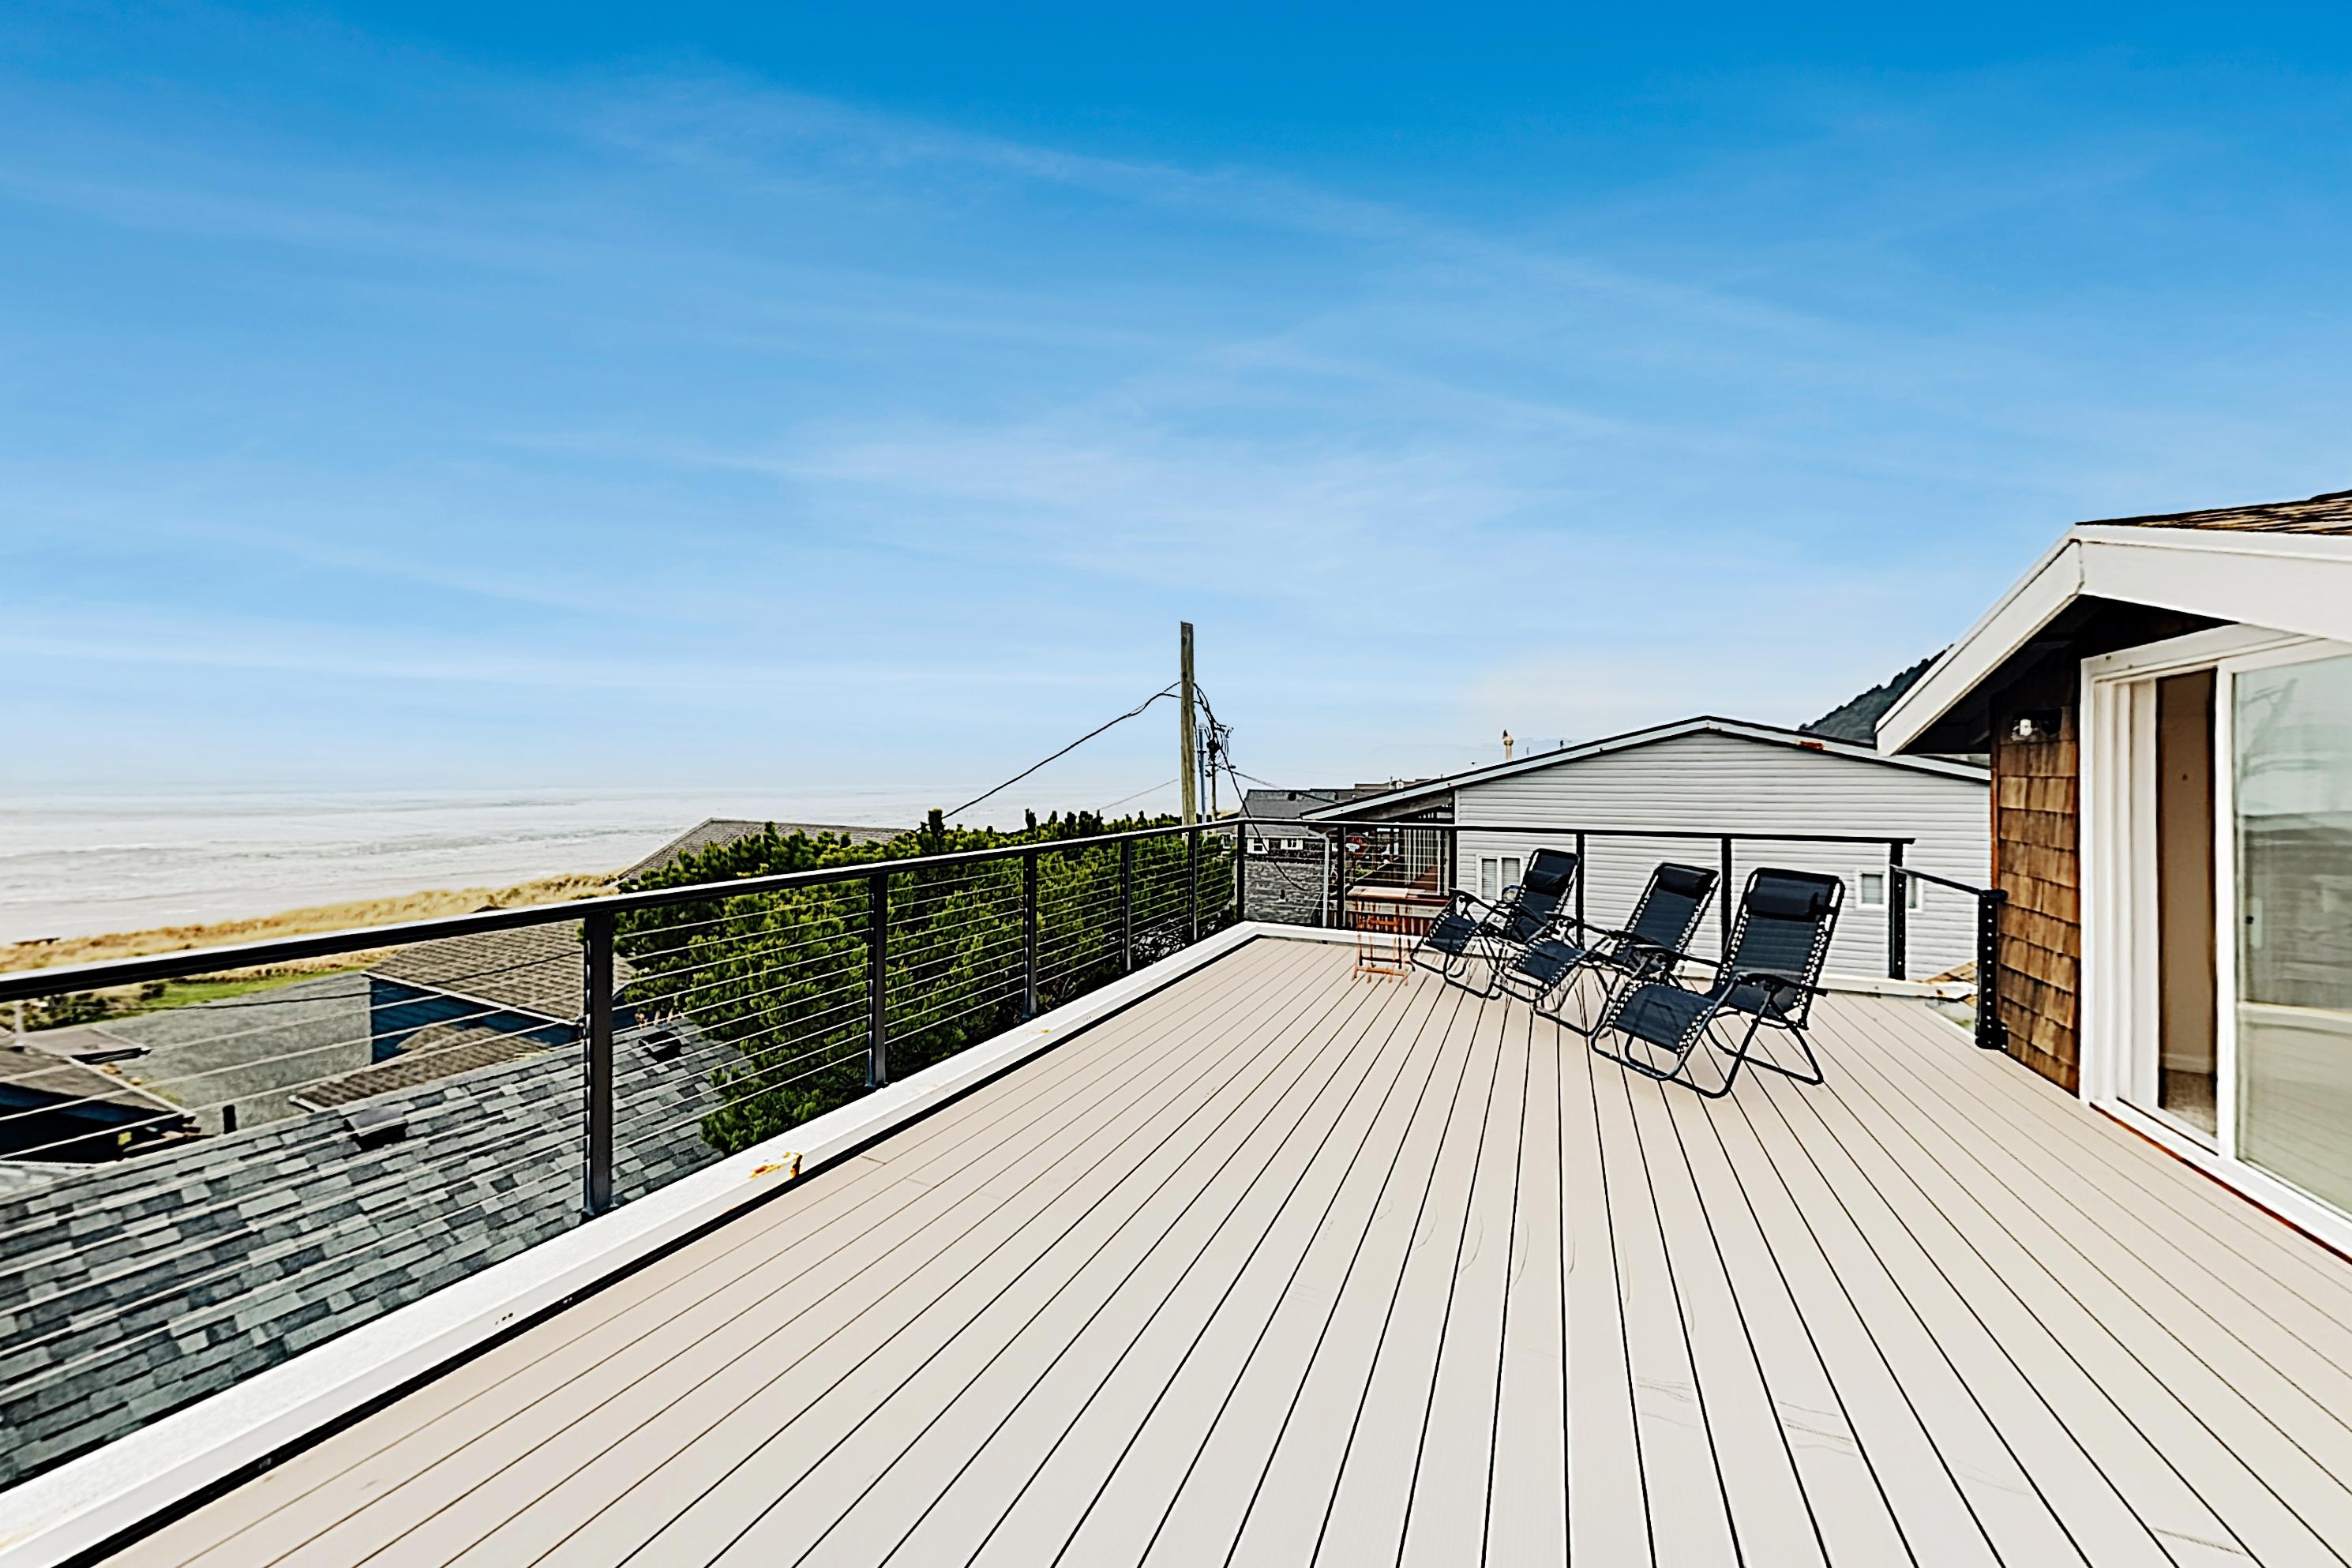 Rockaway Beach OR Vacation Rental Welcome to Rockaway